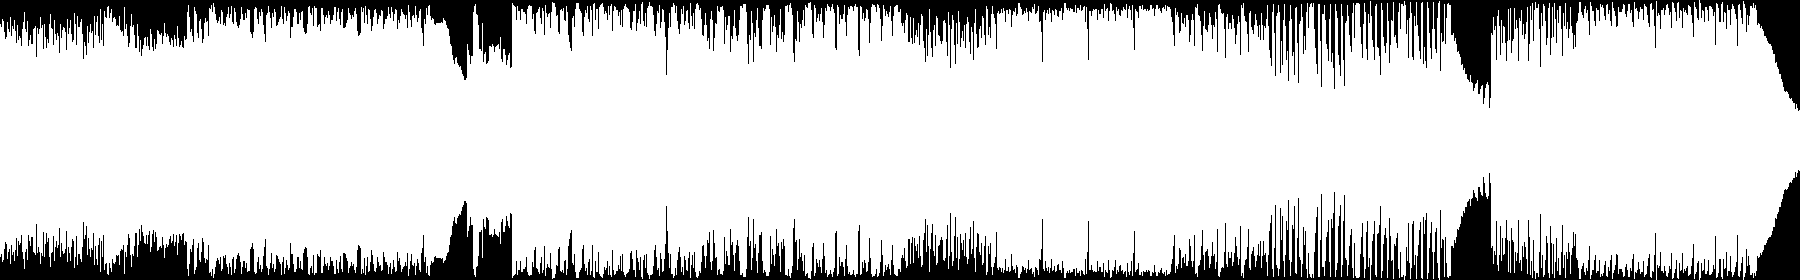 Alchemy - Mid Tempo World Bass by Chamberlain audio waveform